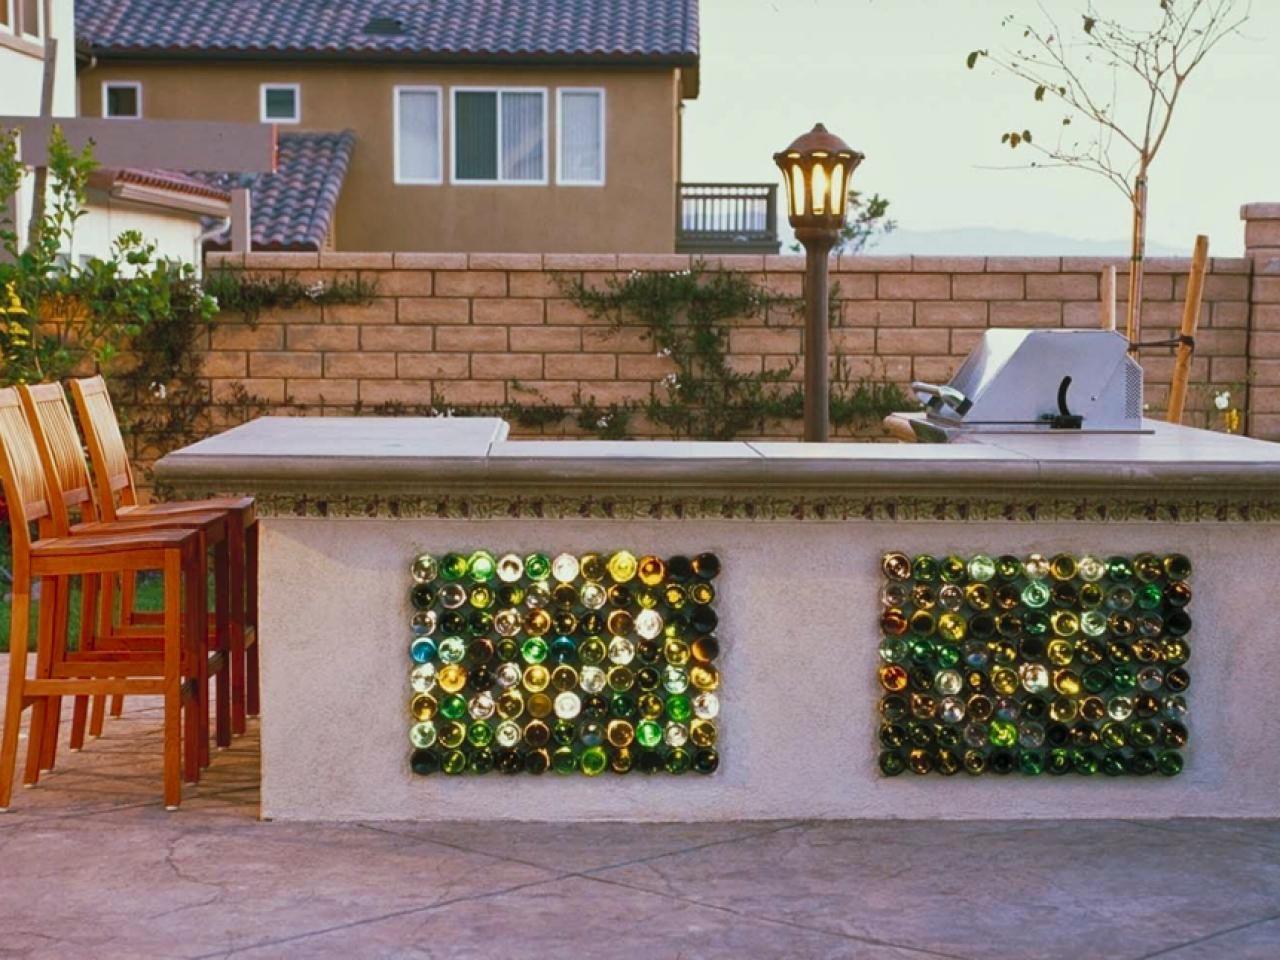 Pictures of Outdoor Kitchen Design Ideas u Inspiration Deck patio